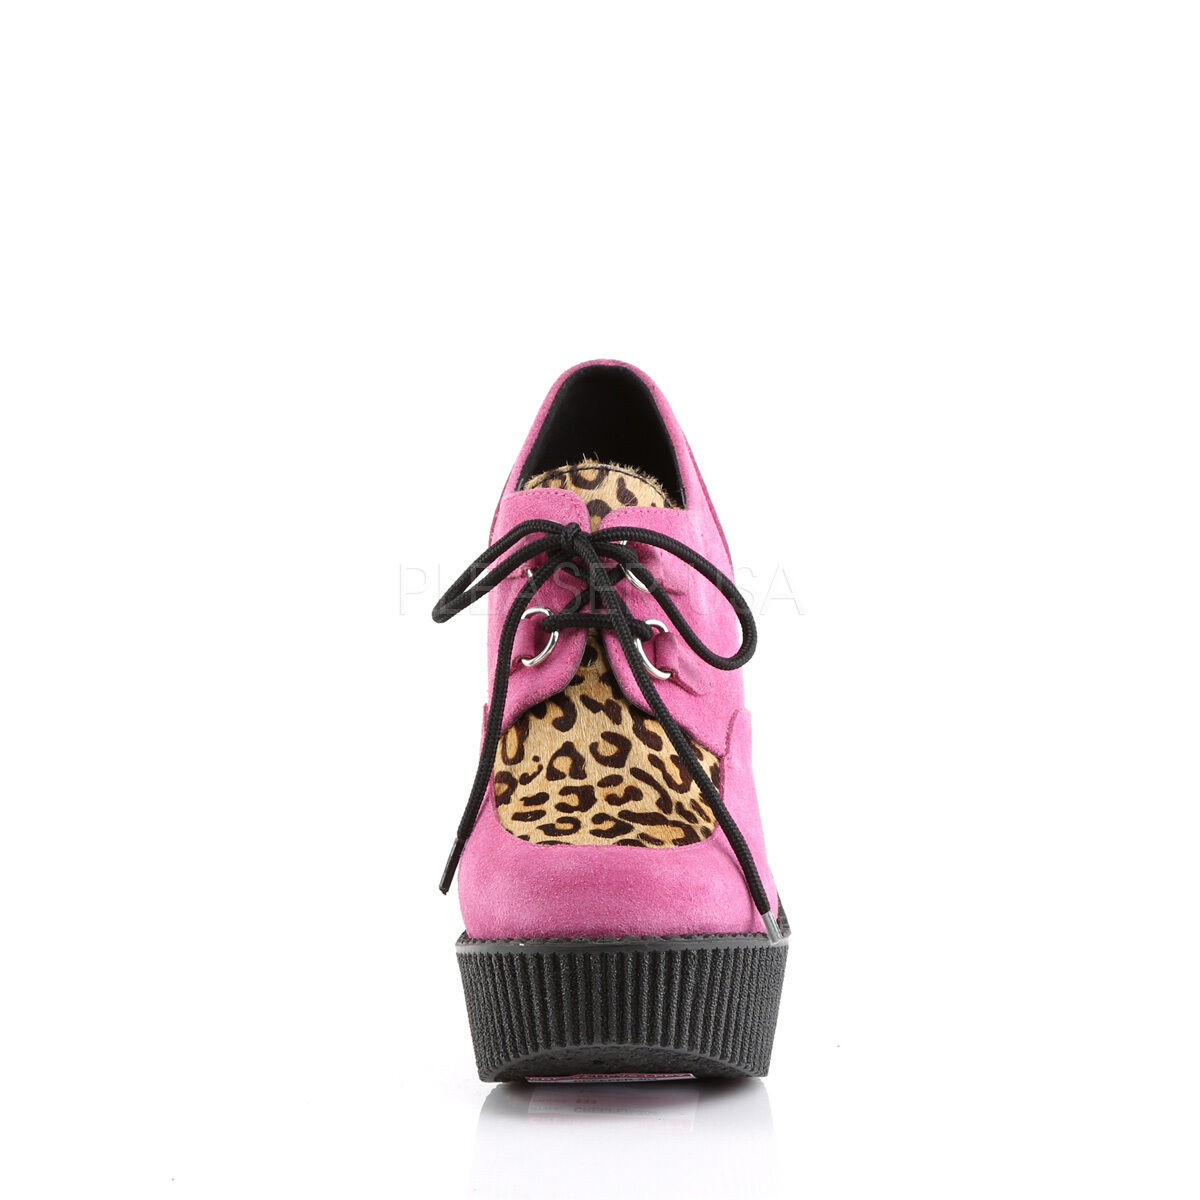 DEMONIA CREEPER-304 Damens Hot Pink & Leopard Wedge Platform Creepers Schuhes